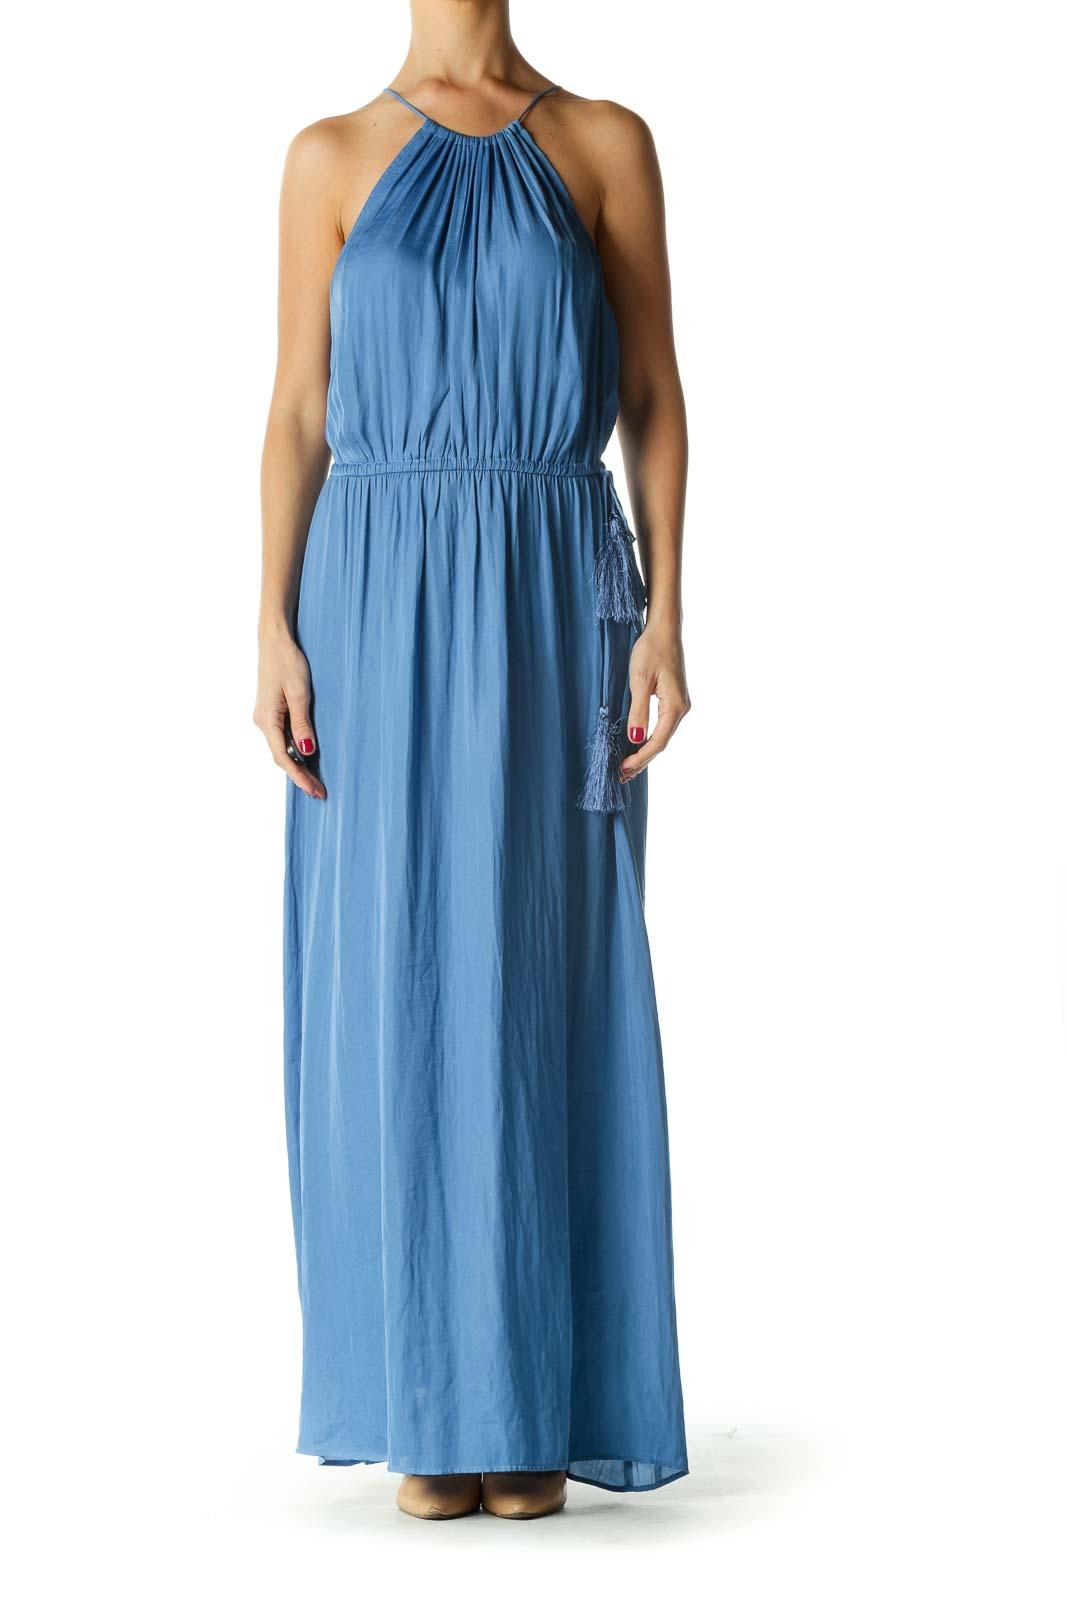 Blue Maxi Halter Dress